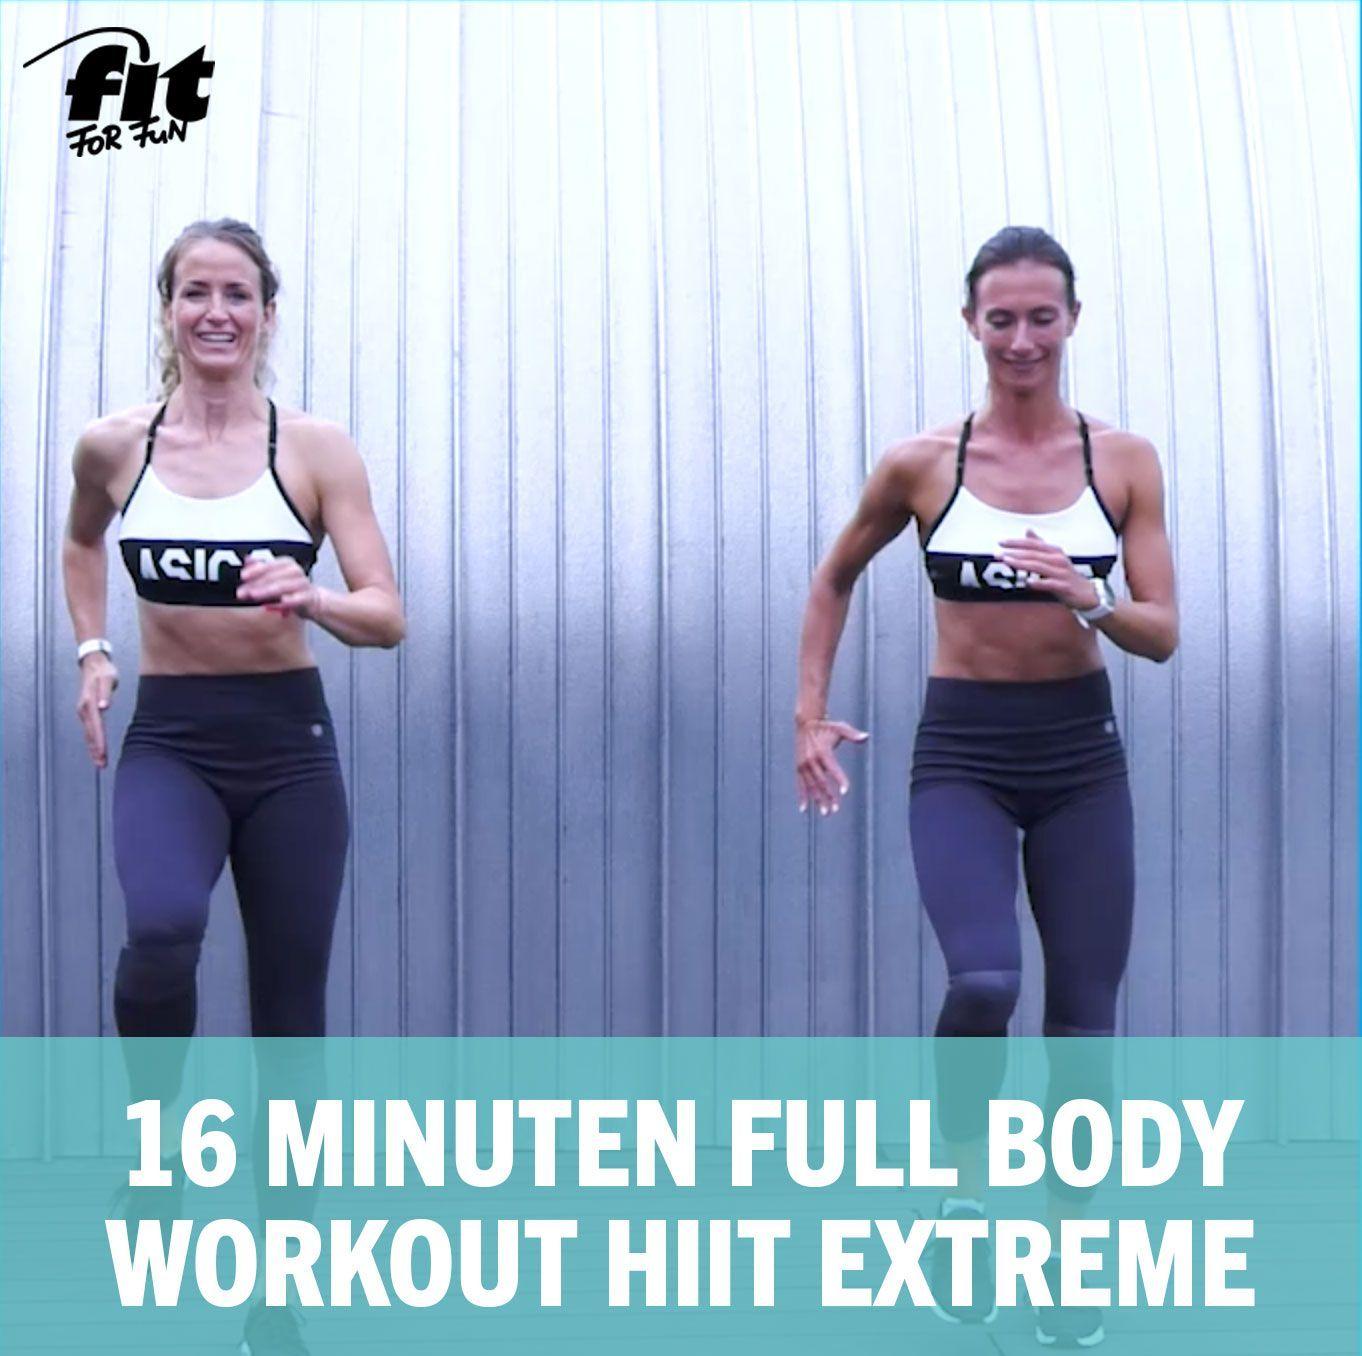 Ganzkörper Bodyweight Training: 16 Minuten Full Body Workout HIIT Extreme,  #body #Bodyweight #extre...